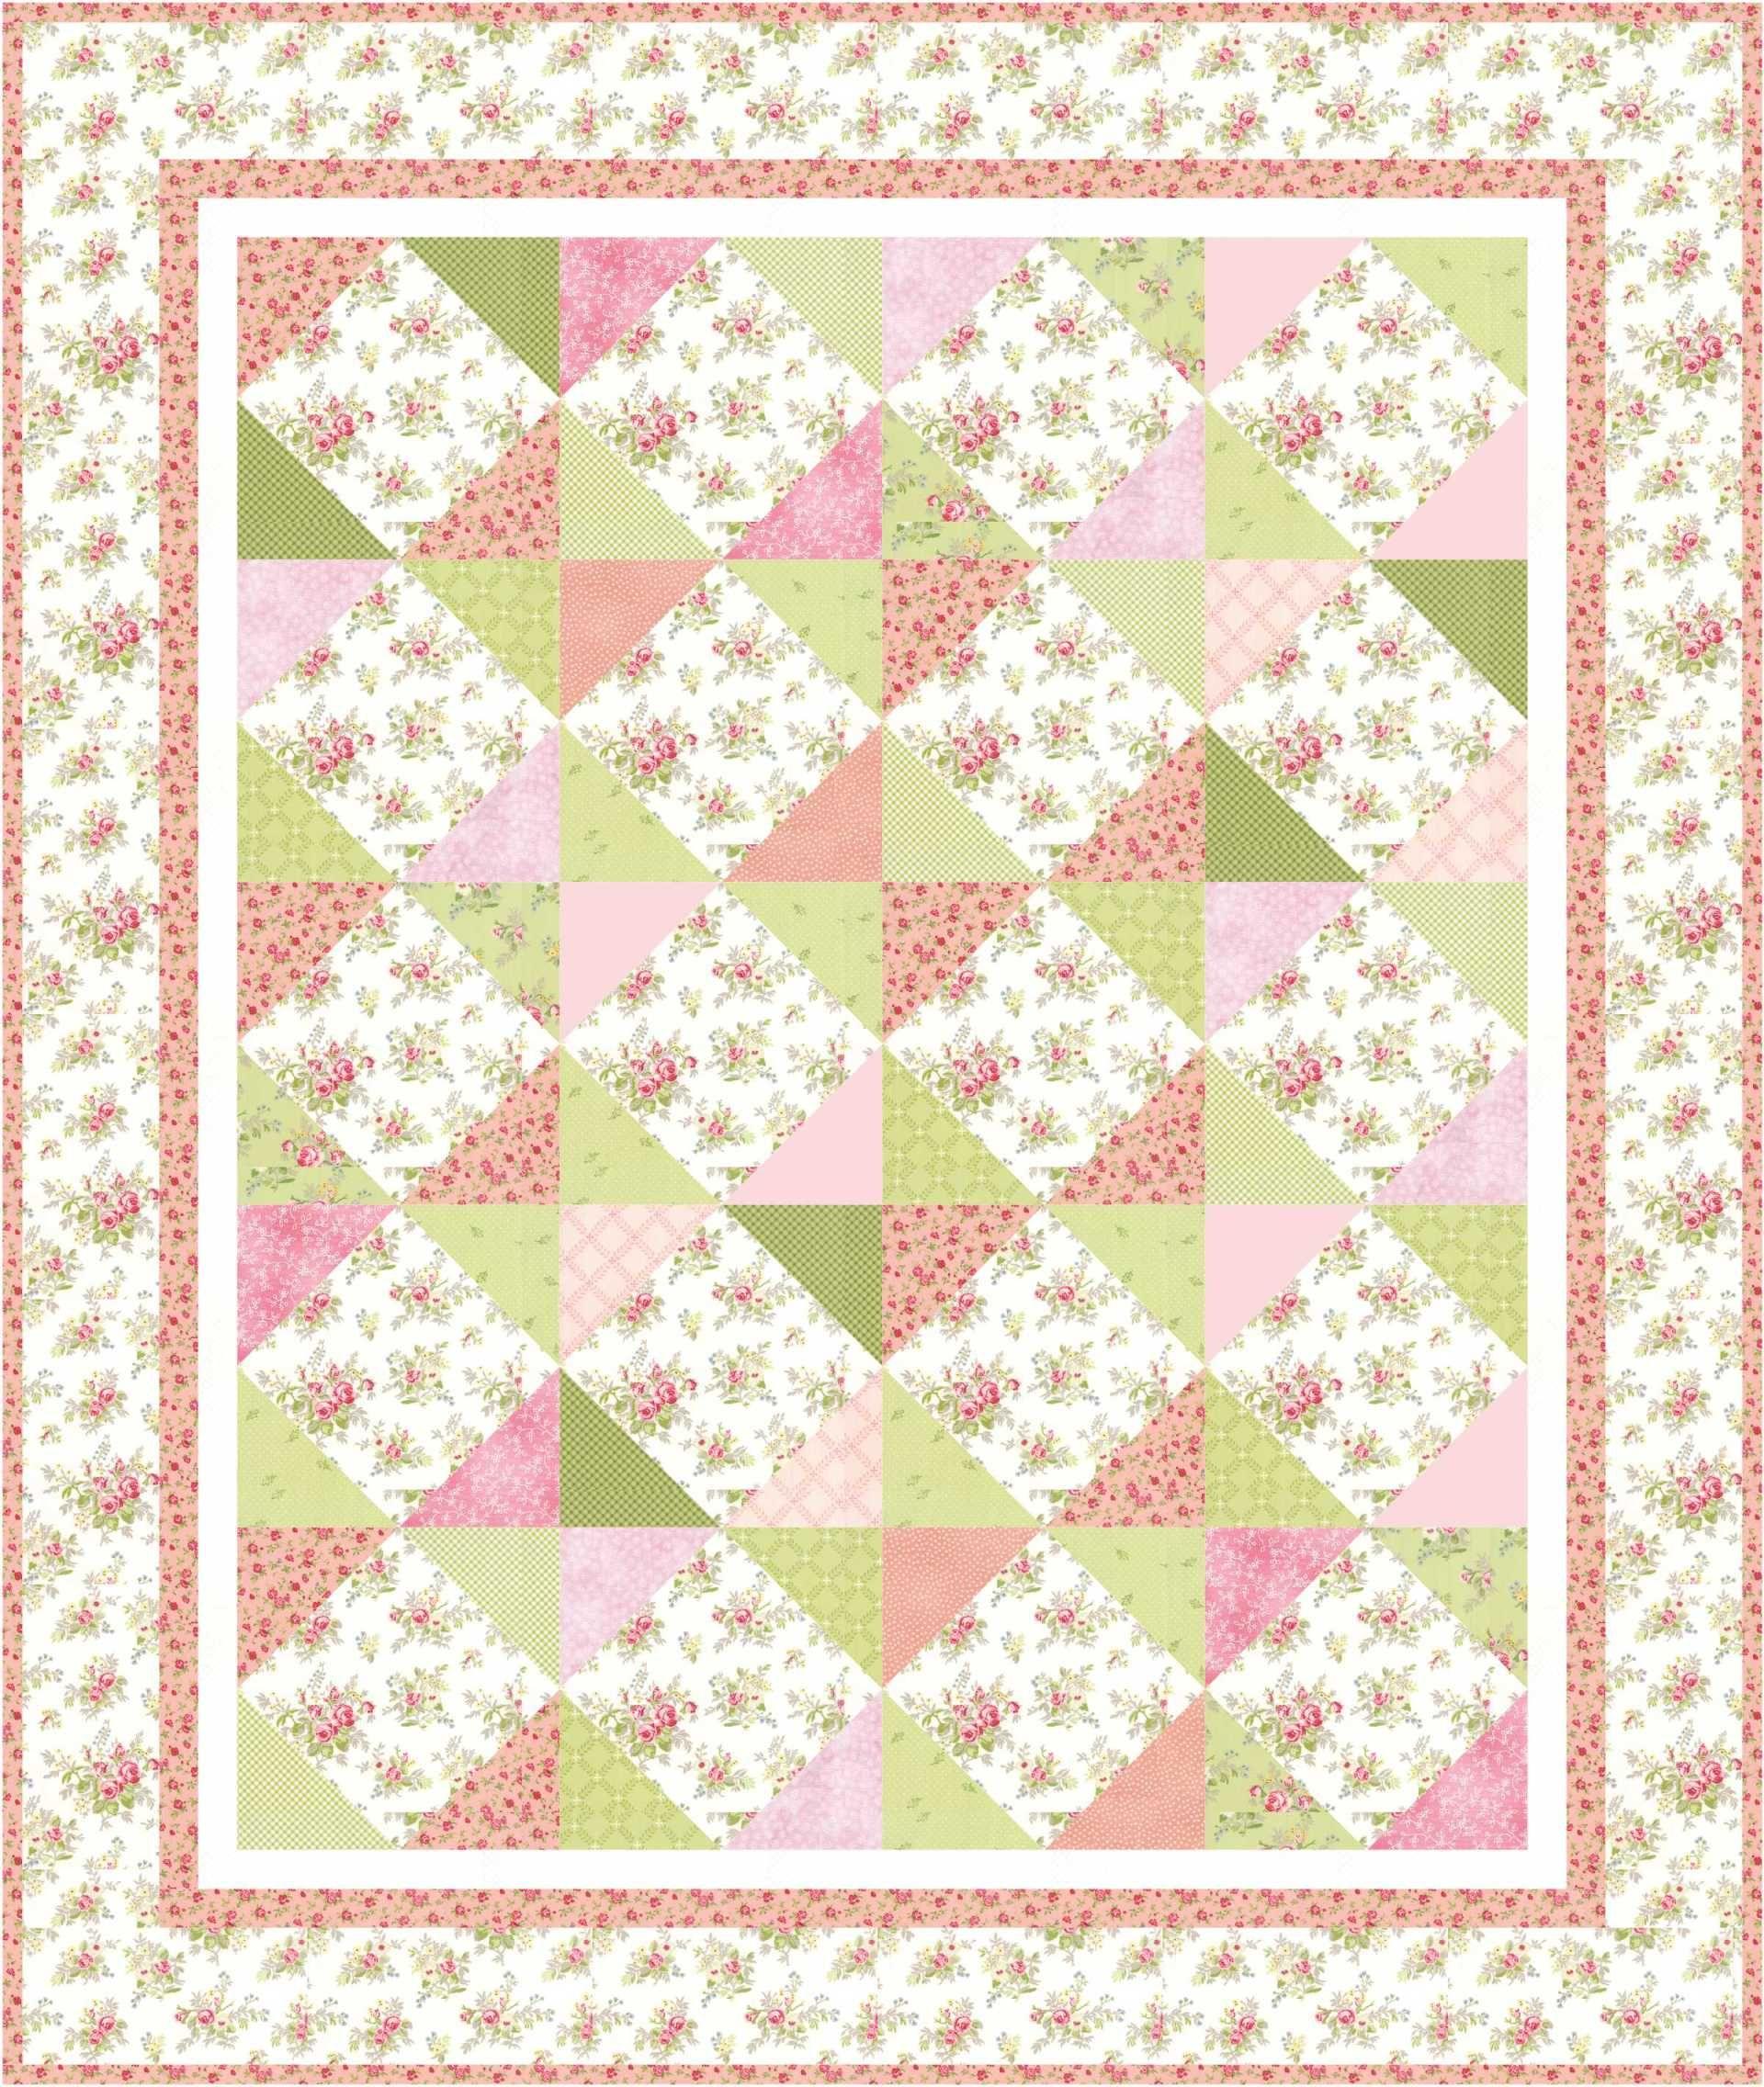 Grammy's Rose Garden Free Quilt Pattern- Jacquelynne Steves